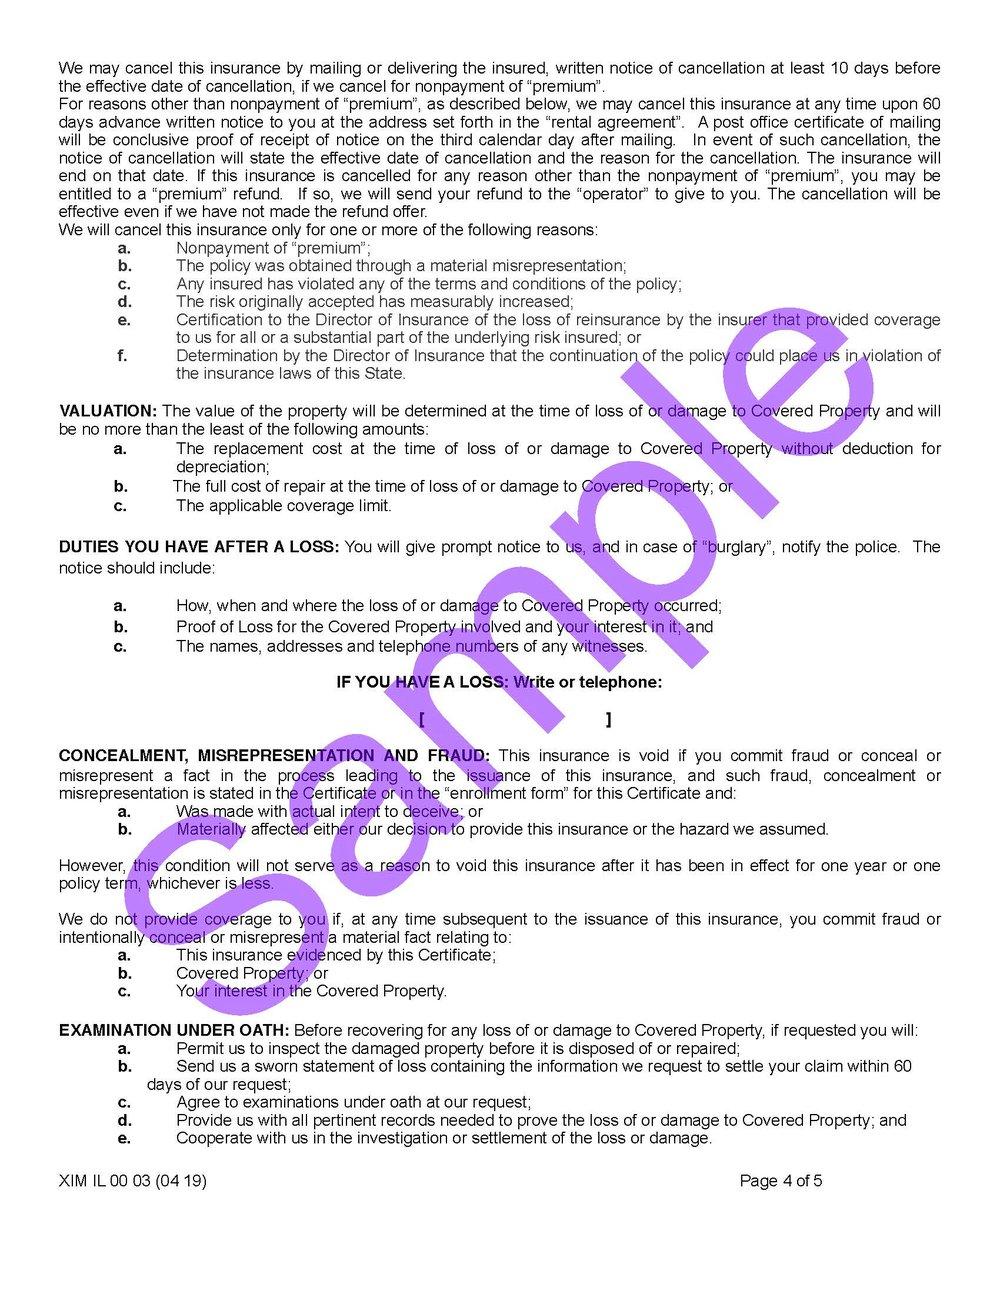 XIM IL 00 03 04 19 Illinois Certificate of InsuranceSample_Page_4.jpg